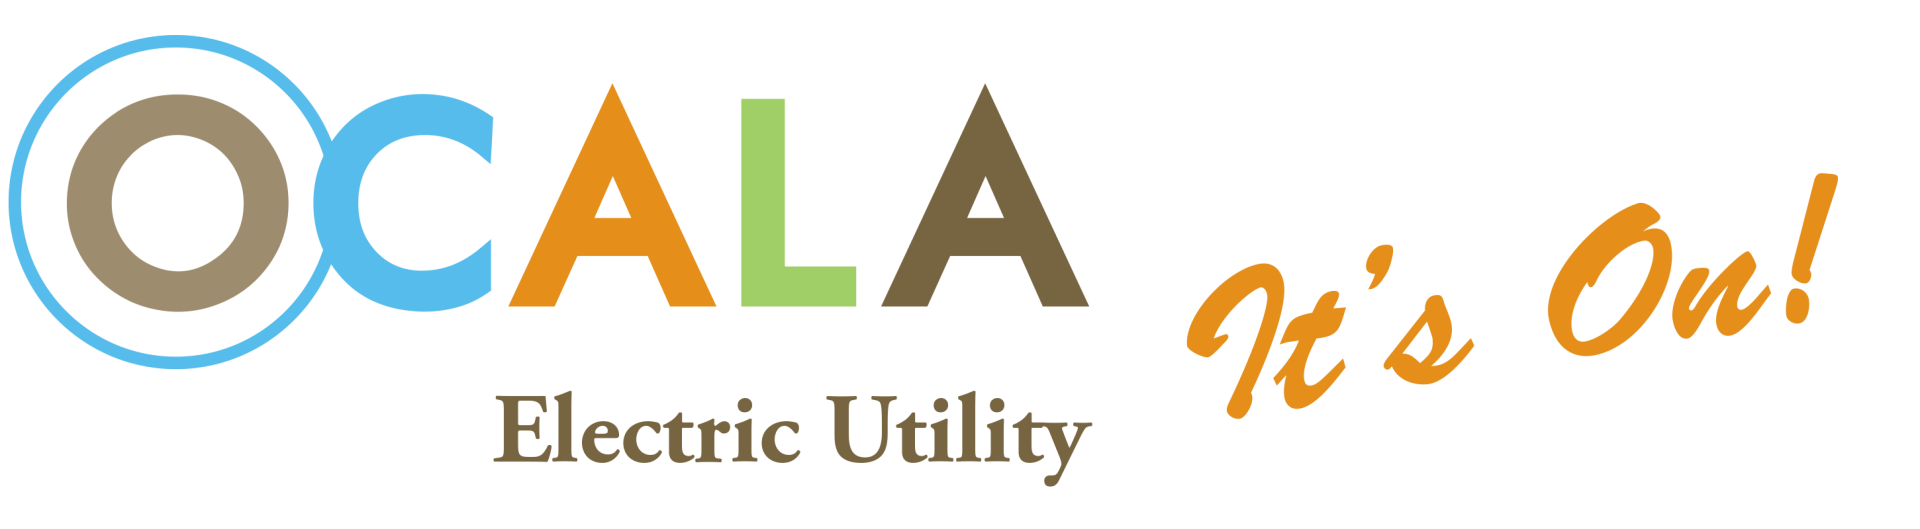 Ocala City Electric logo